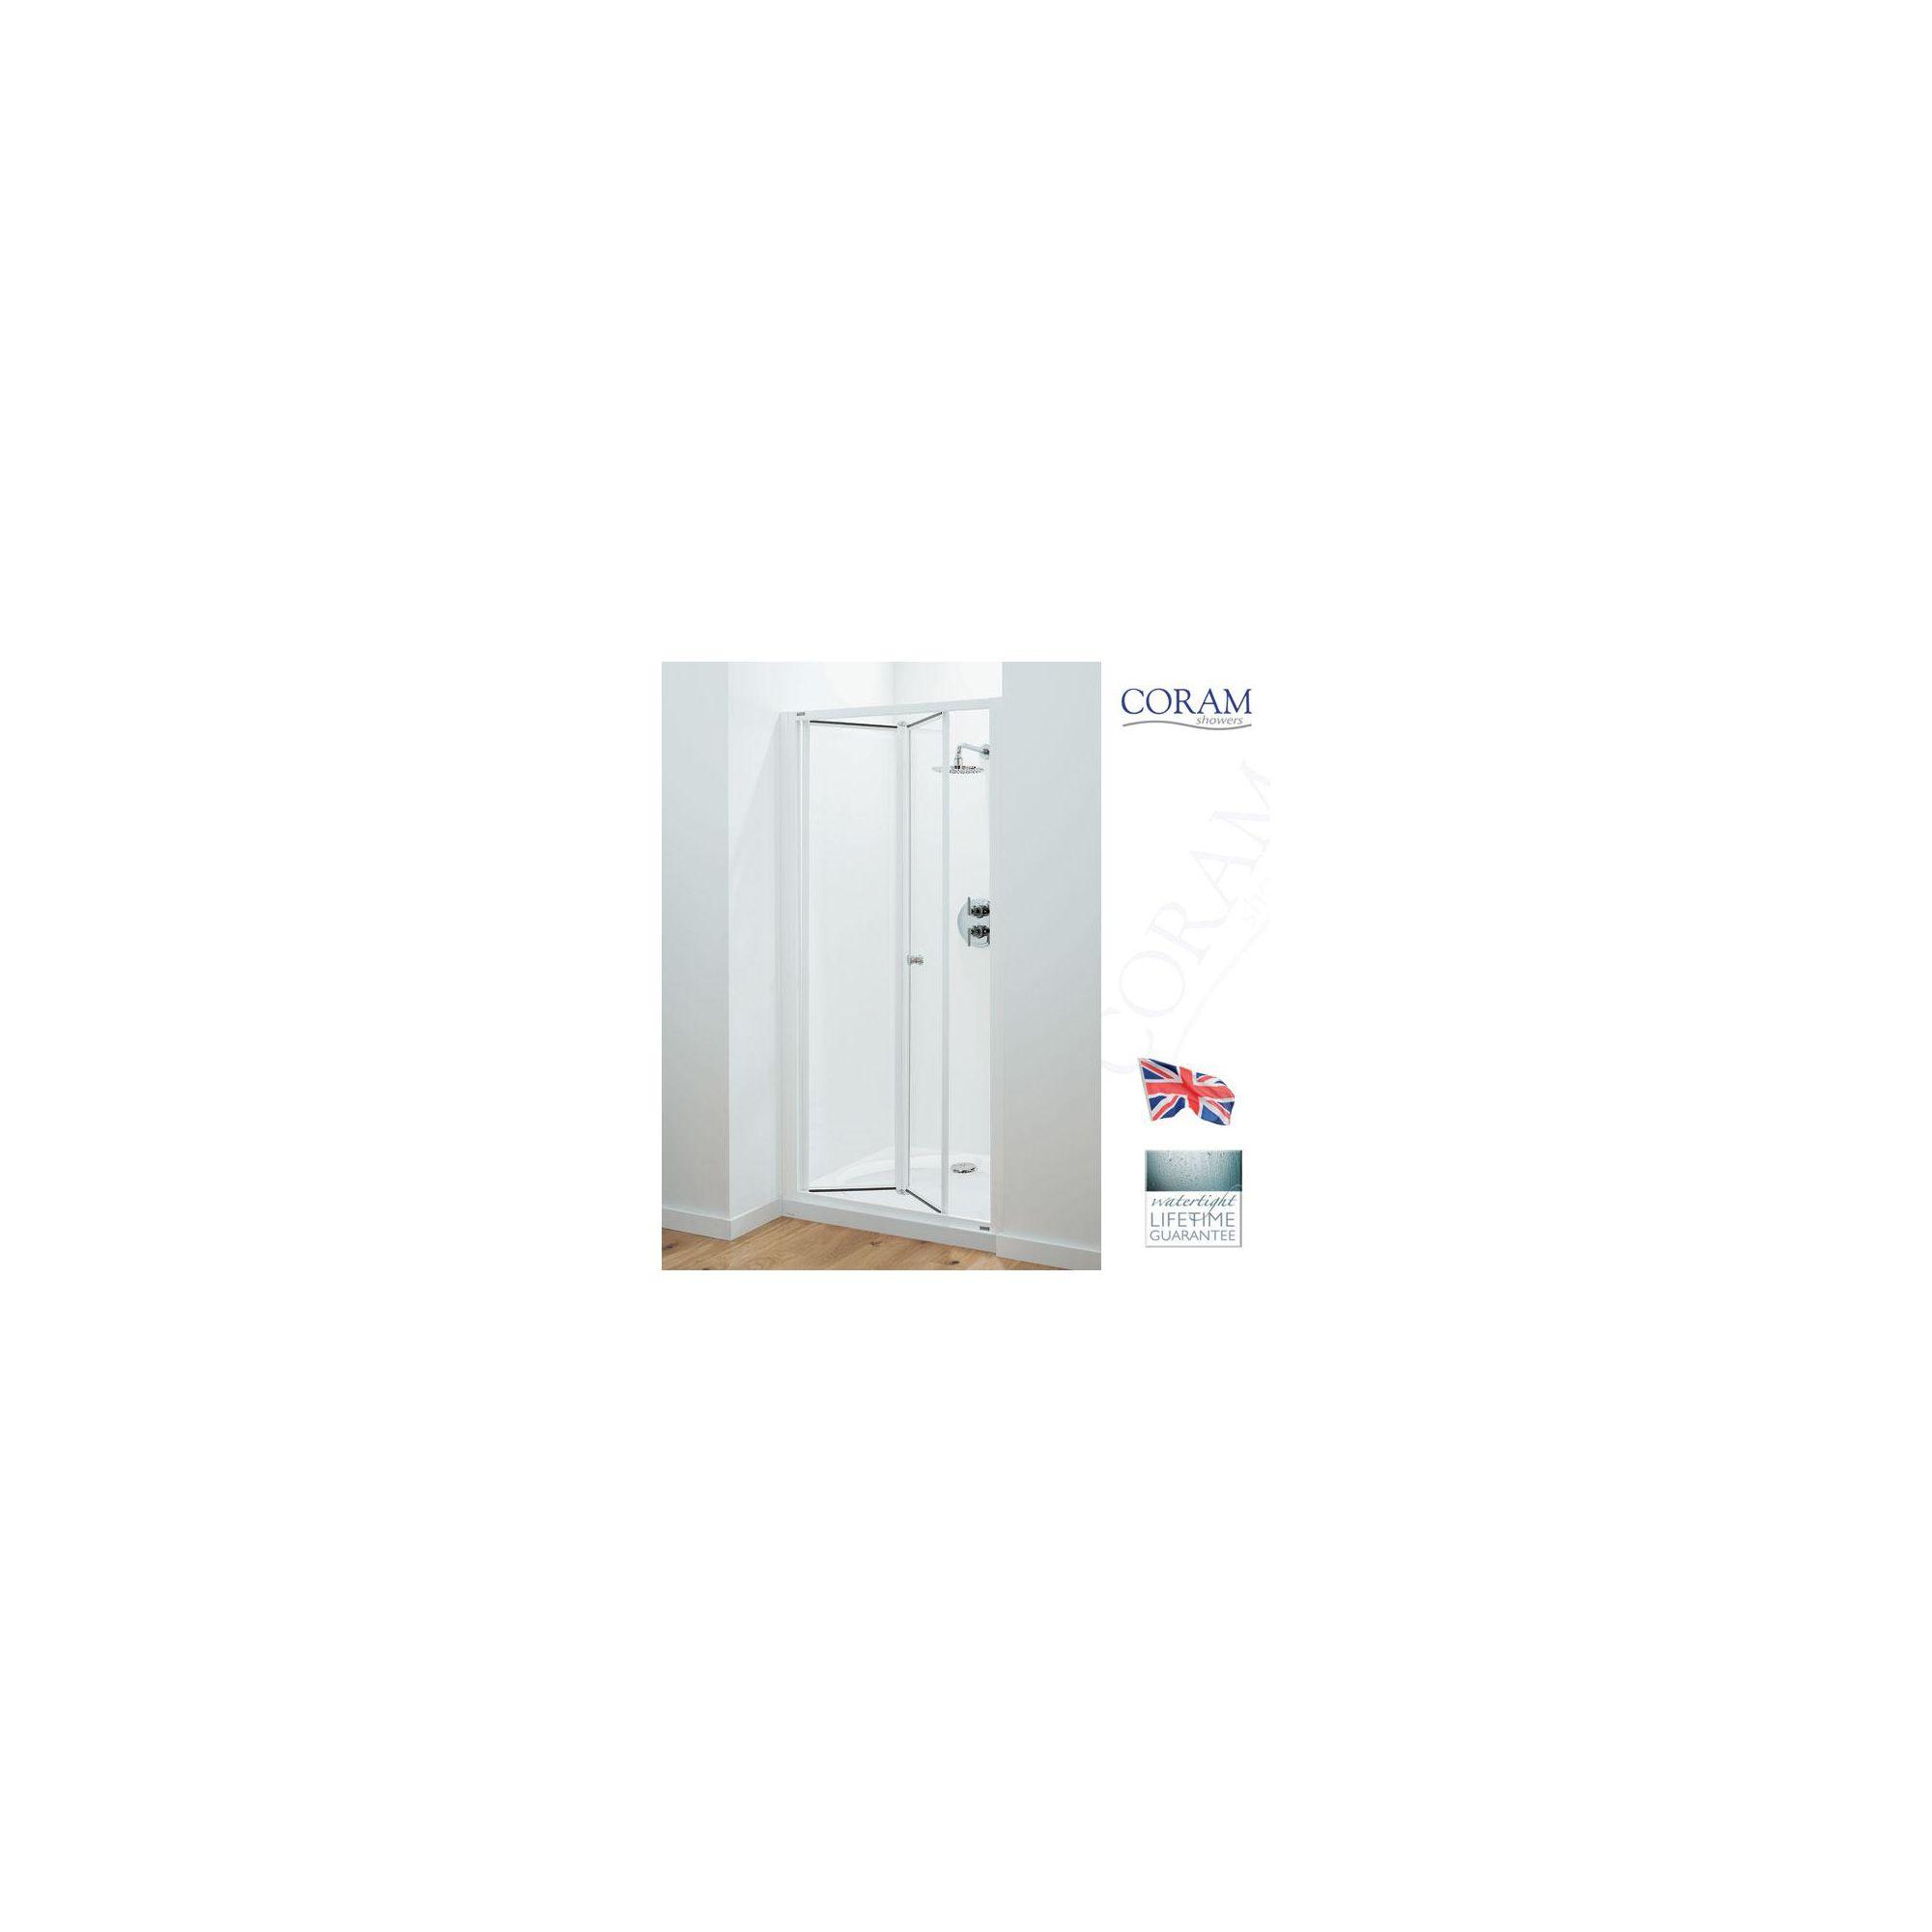 Coram Optima Bi-Fold Door ALCOVE Shower Enclosure, 800mm x 800mm, Low Profile Tray, 6mm Glass at Tescos Direct